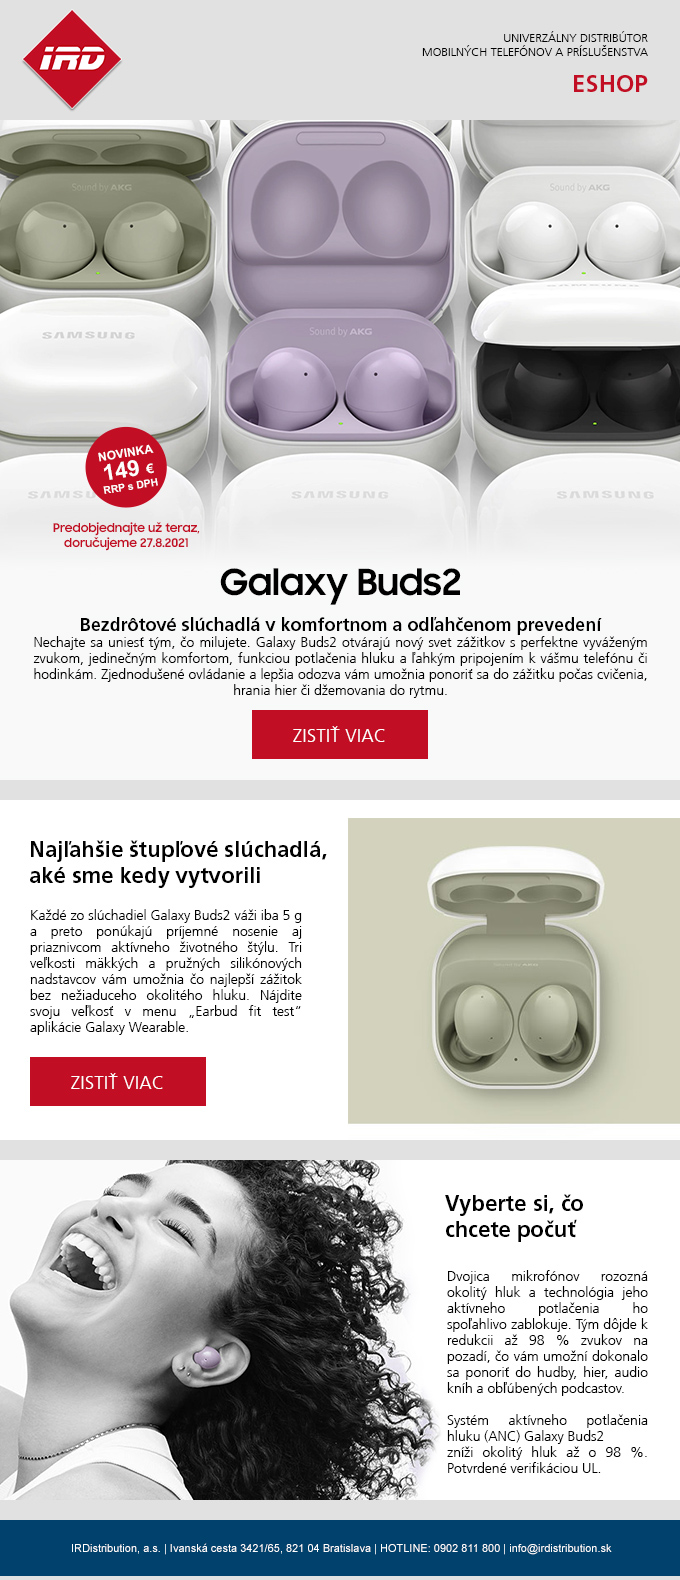 nl-ird-samsung-galaxy-buds2